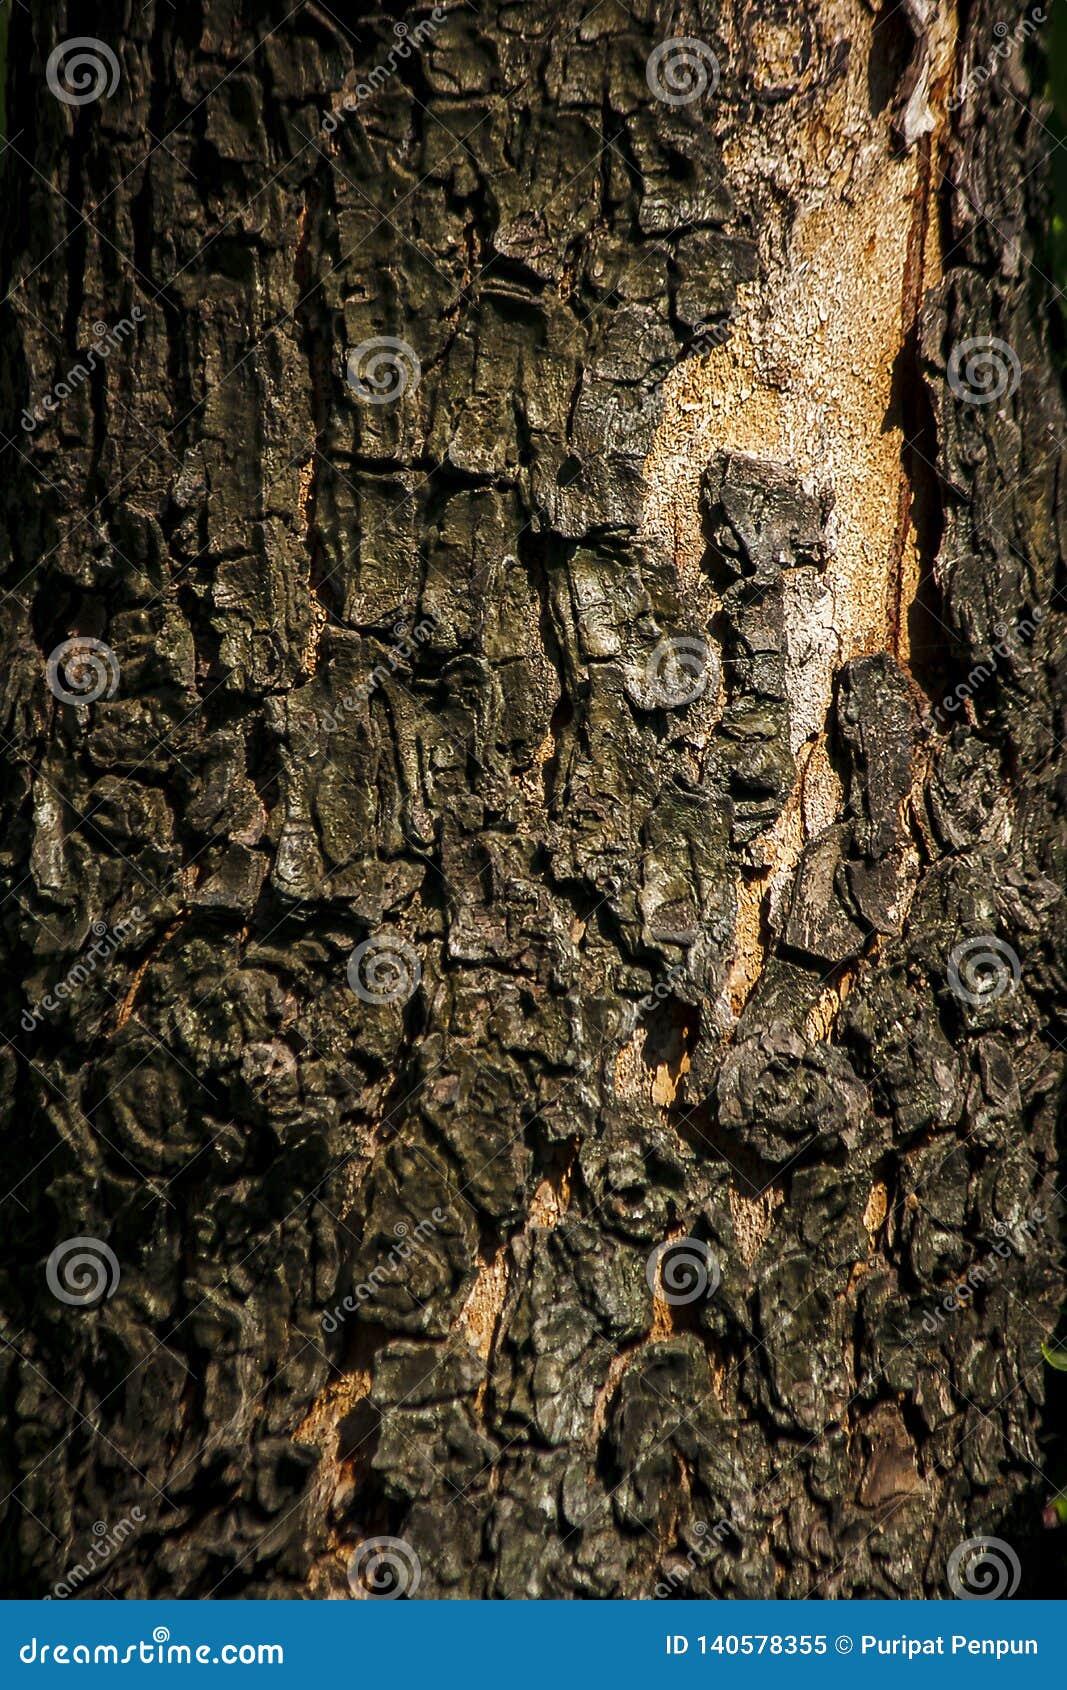 Trunk Bark Is Dry Rough Skin Wallpaper Stock Image Image Of Bark Environment 140578355